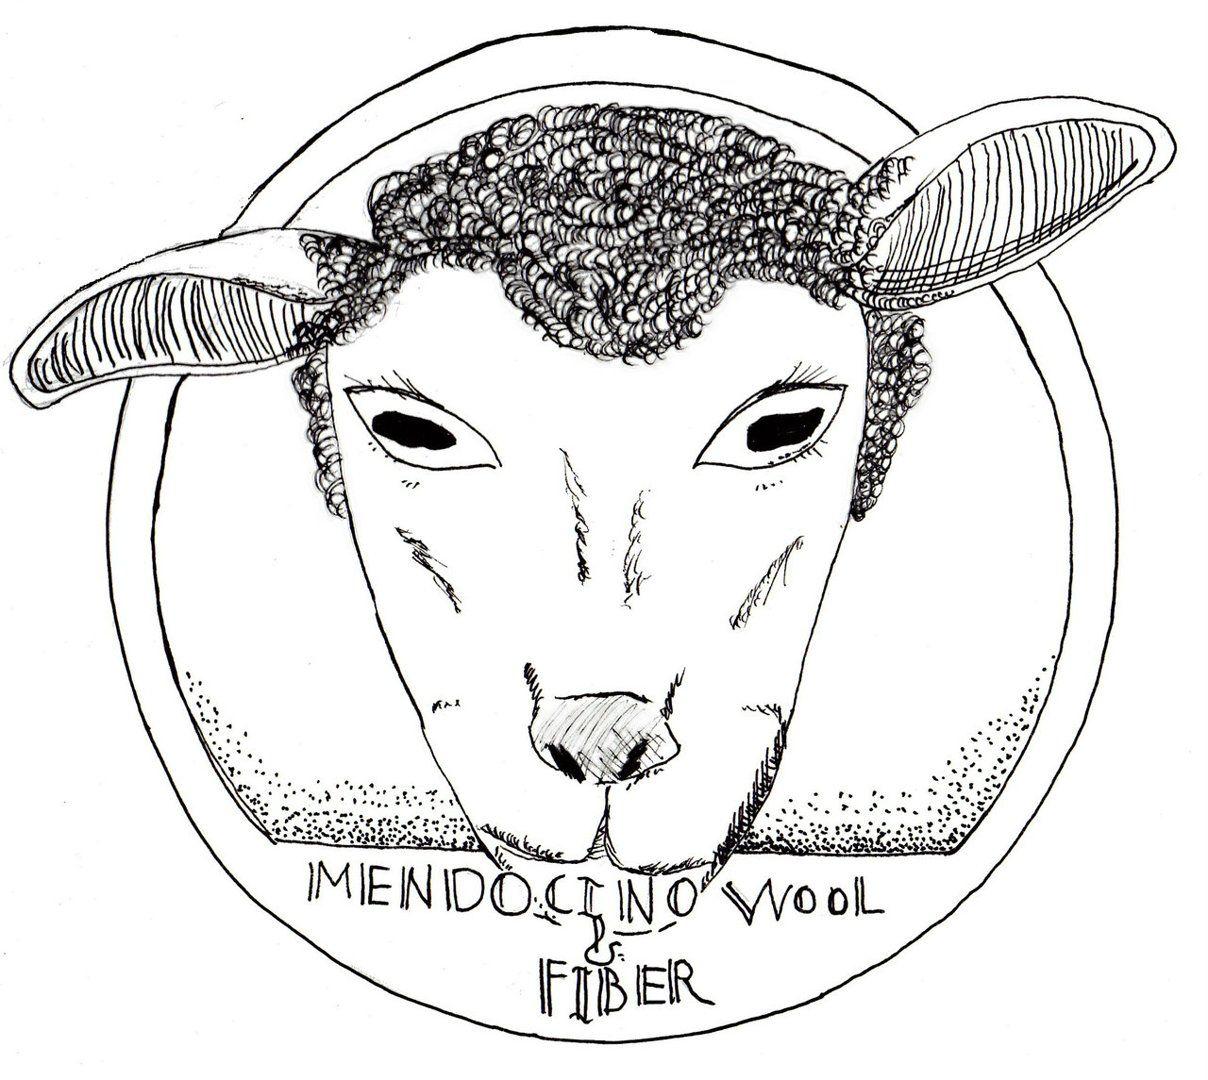 Mendocino Wool And Fiber